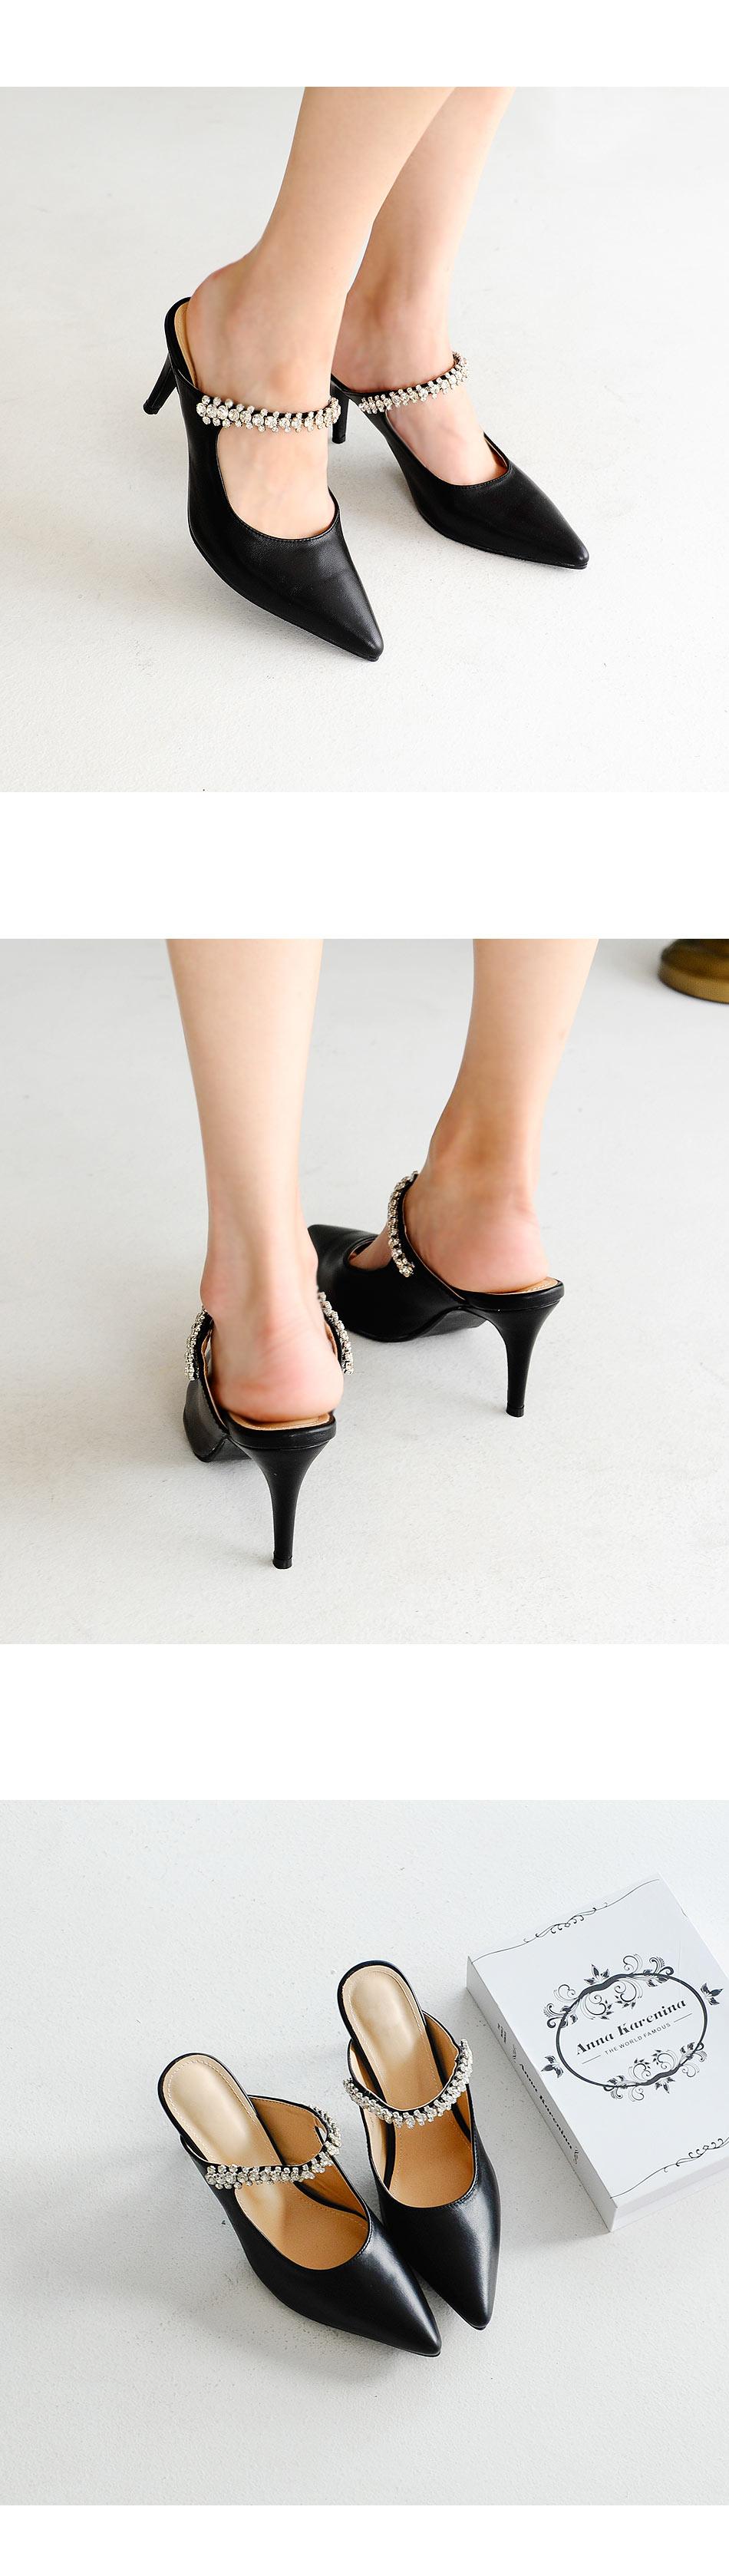 Nibella Mule Slippers 3,8cm